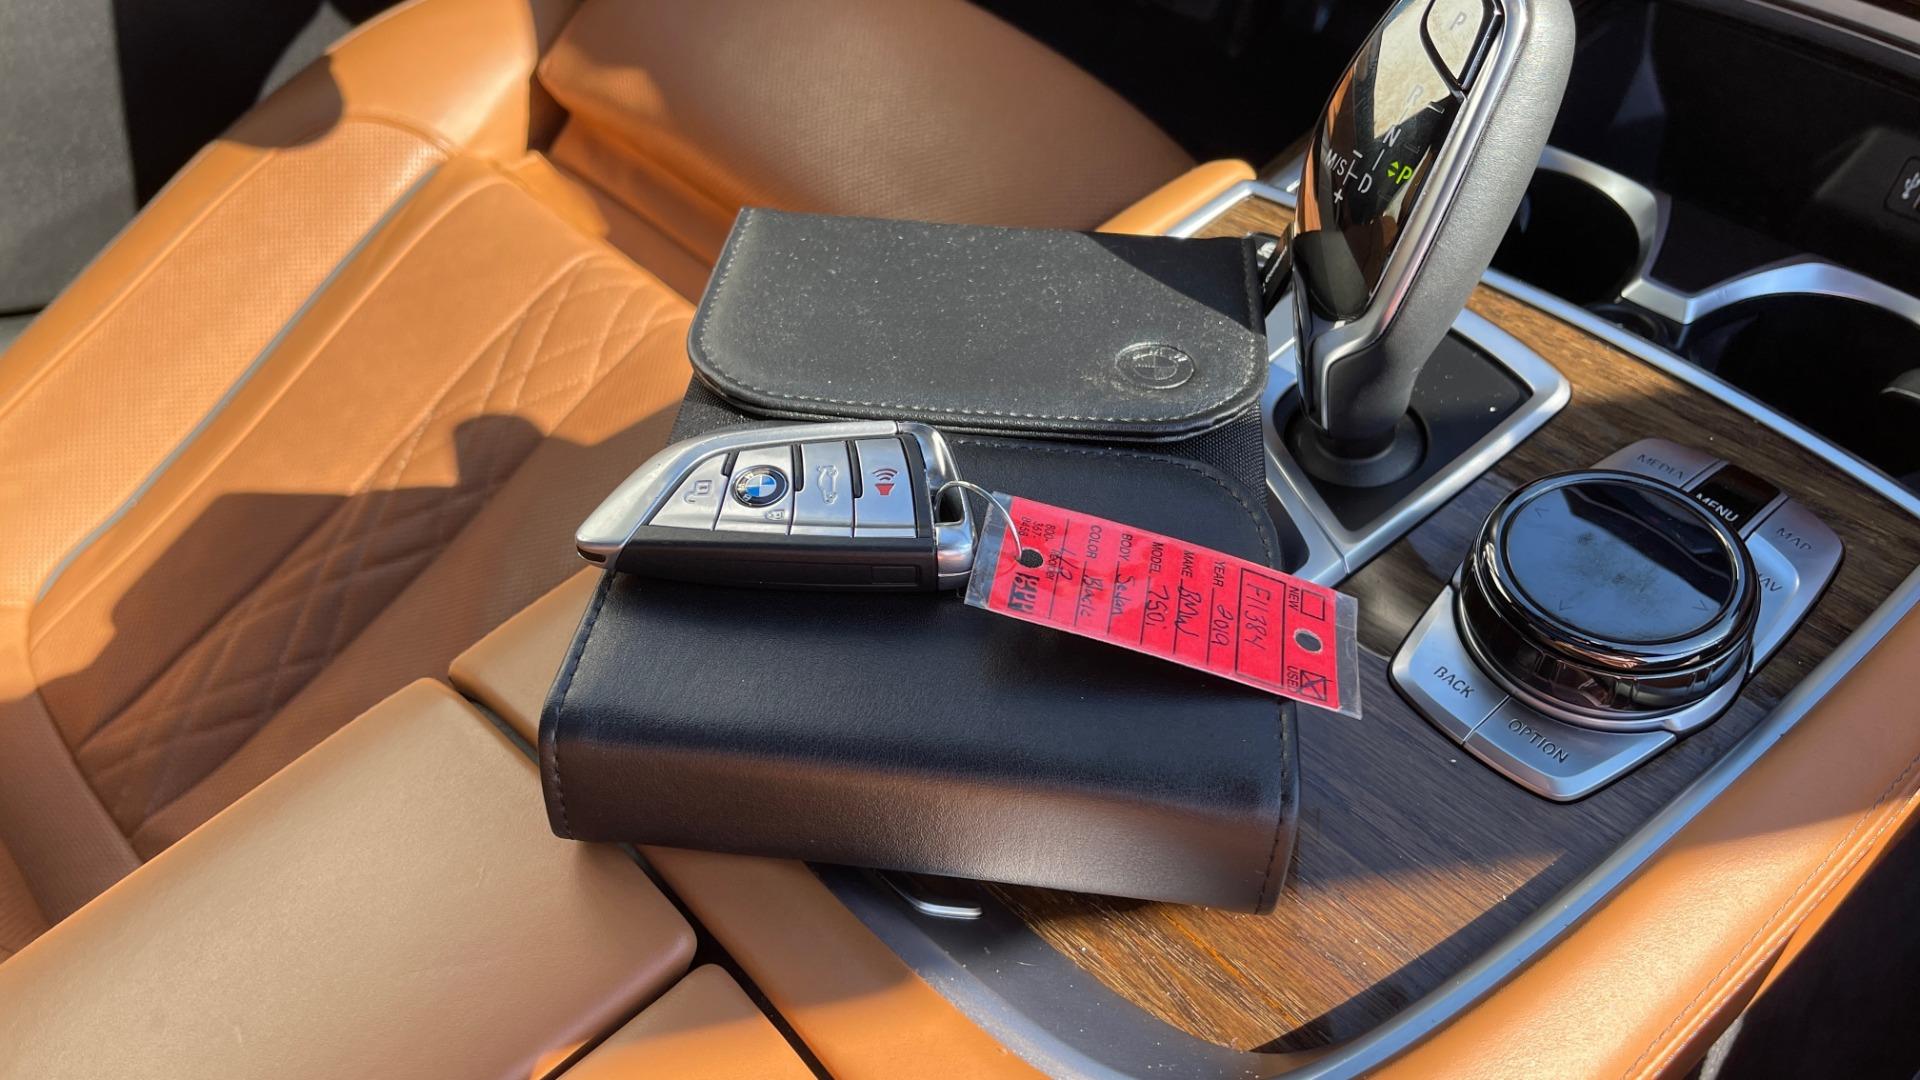 Used 2019 BMW 7 SERIES 750I XDRIVE M-SPORT / EXEC PKG / DRVR ASST PLUS / CLD WTHR / PAR for sale $60,995 at Formula Imports in Charlotte NC 28227 66